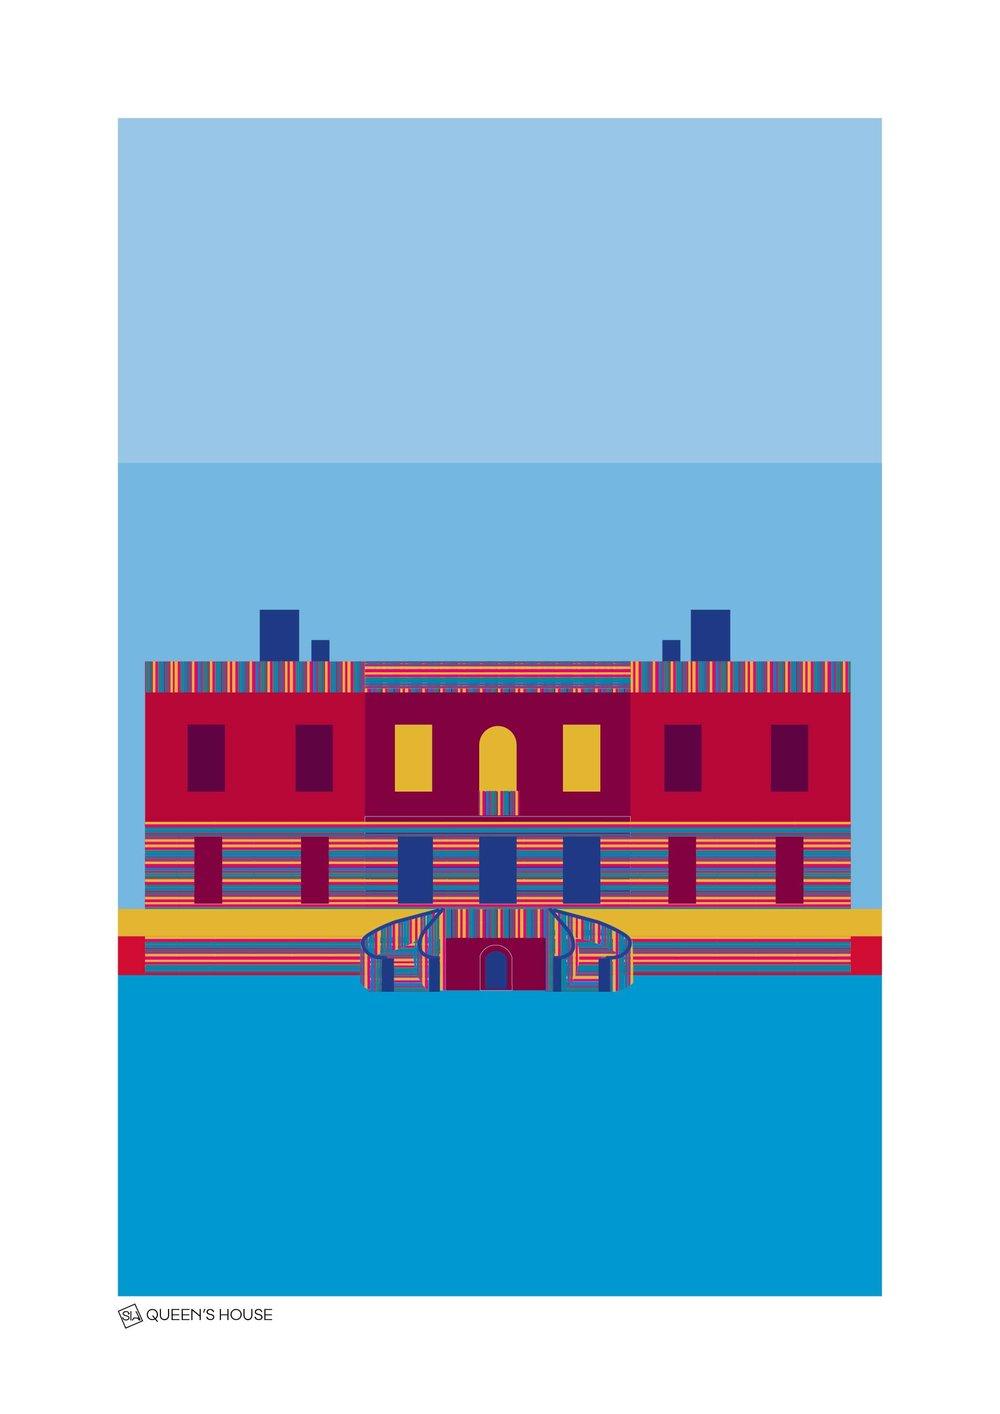 London 100_93_Queens House Greenwich Jewel.jpg